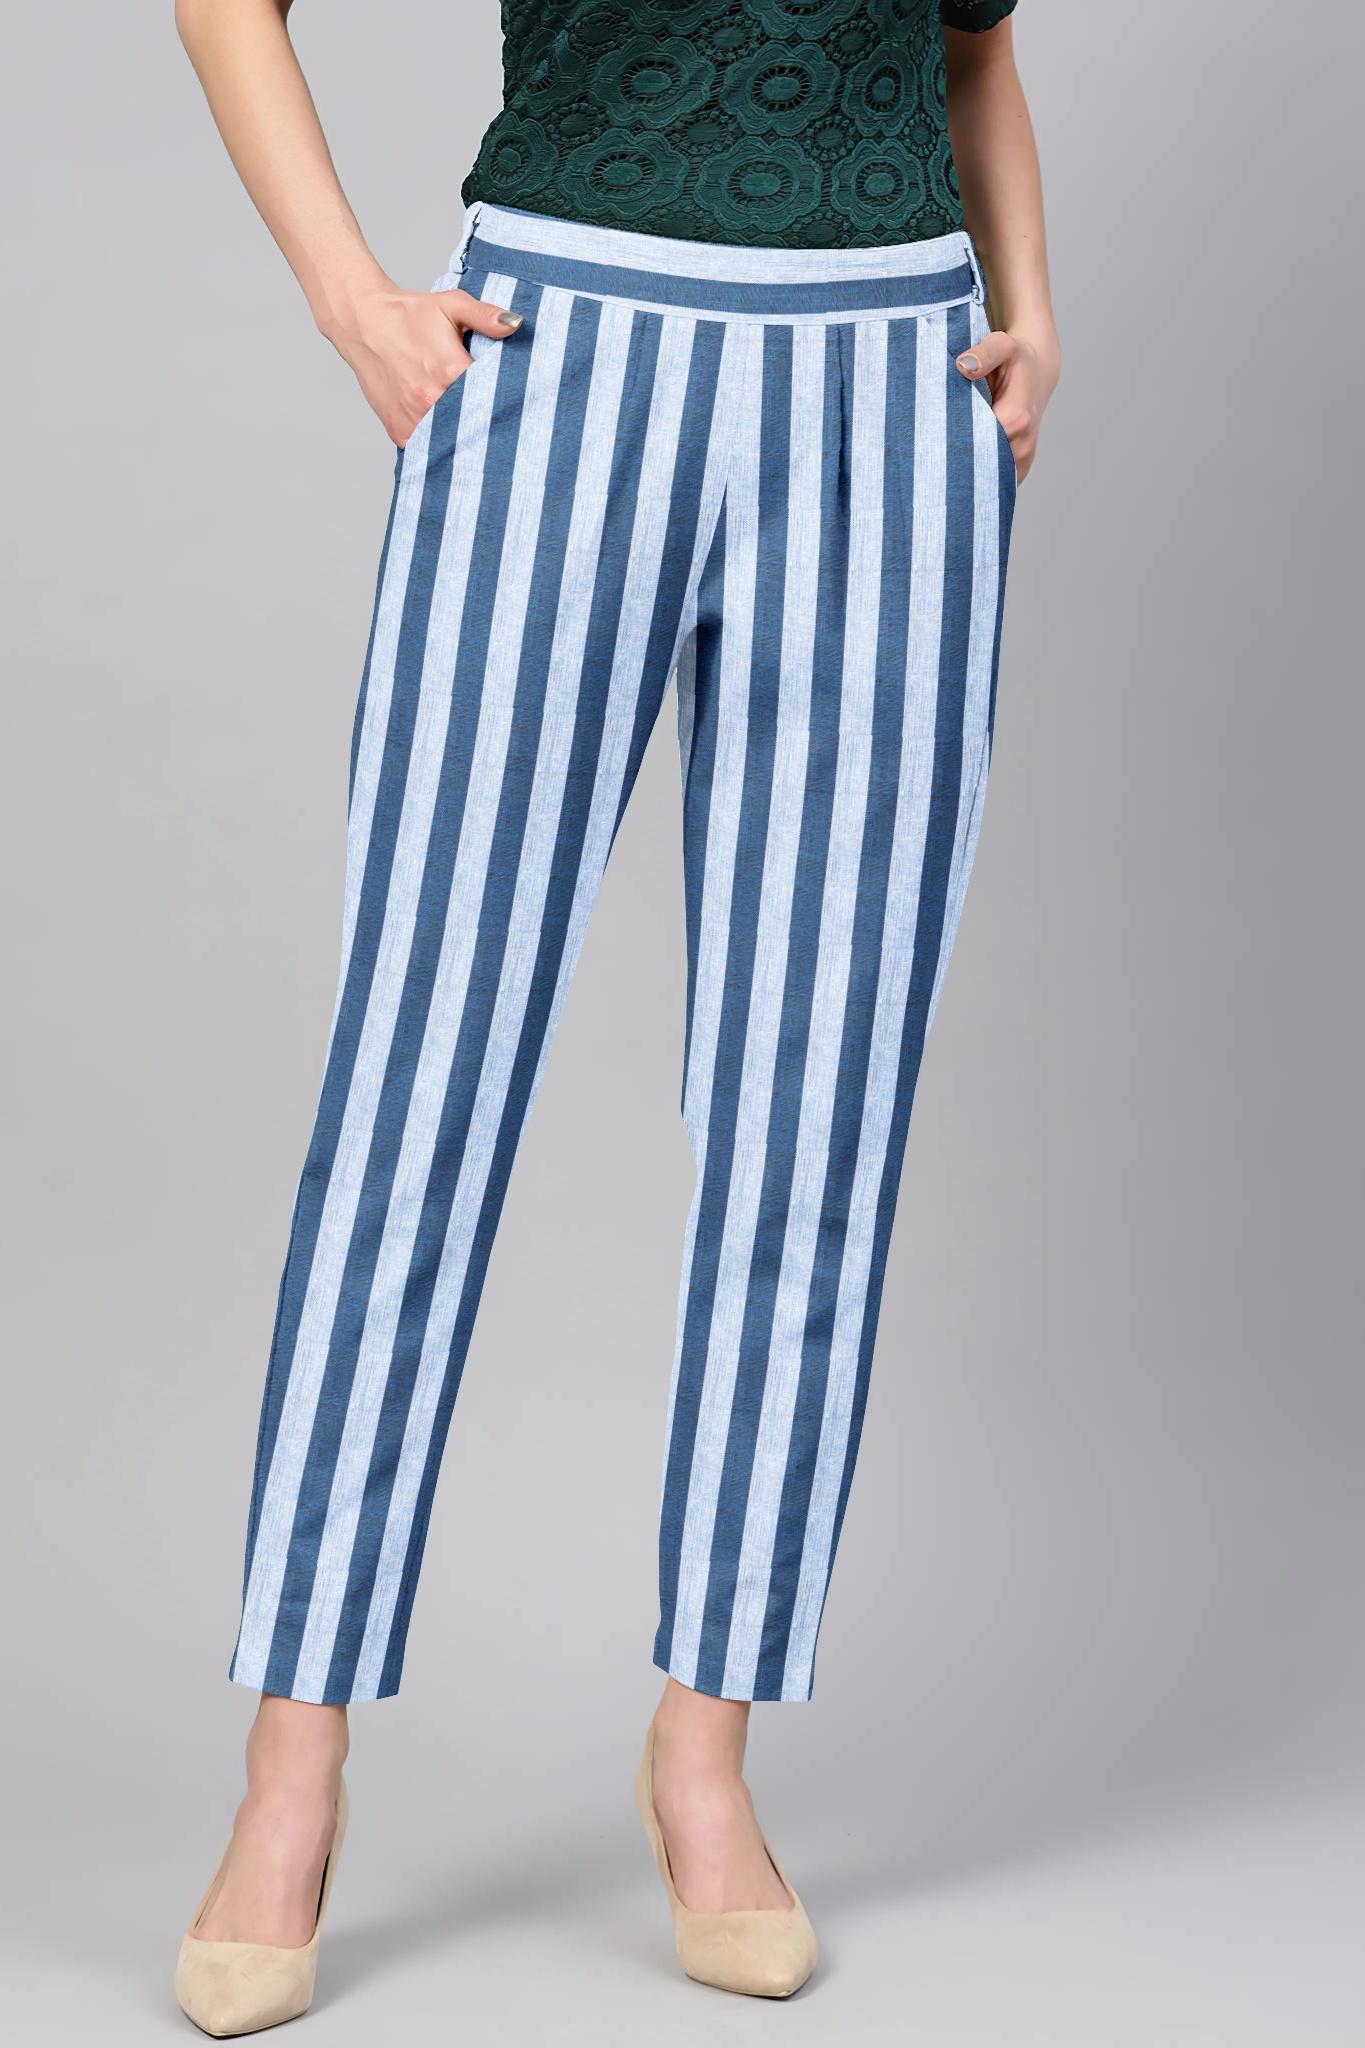 /home/customer/www/fabartcraft.com/public_html/uploadshttps://www.shopolics.com/uploads/images/medium/White-Blue-Cotton-Stripe-Regular-Fit-Solid-Trouser-36089.jpg